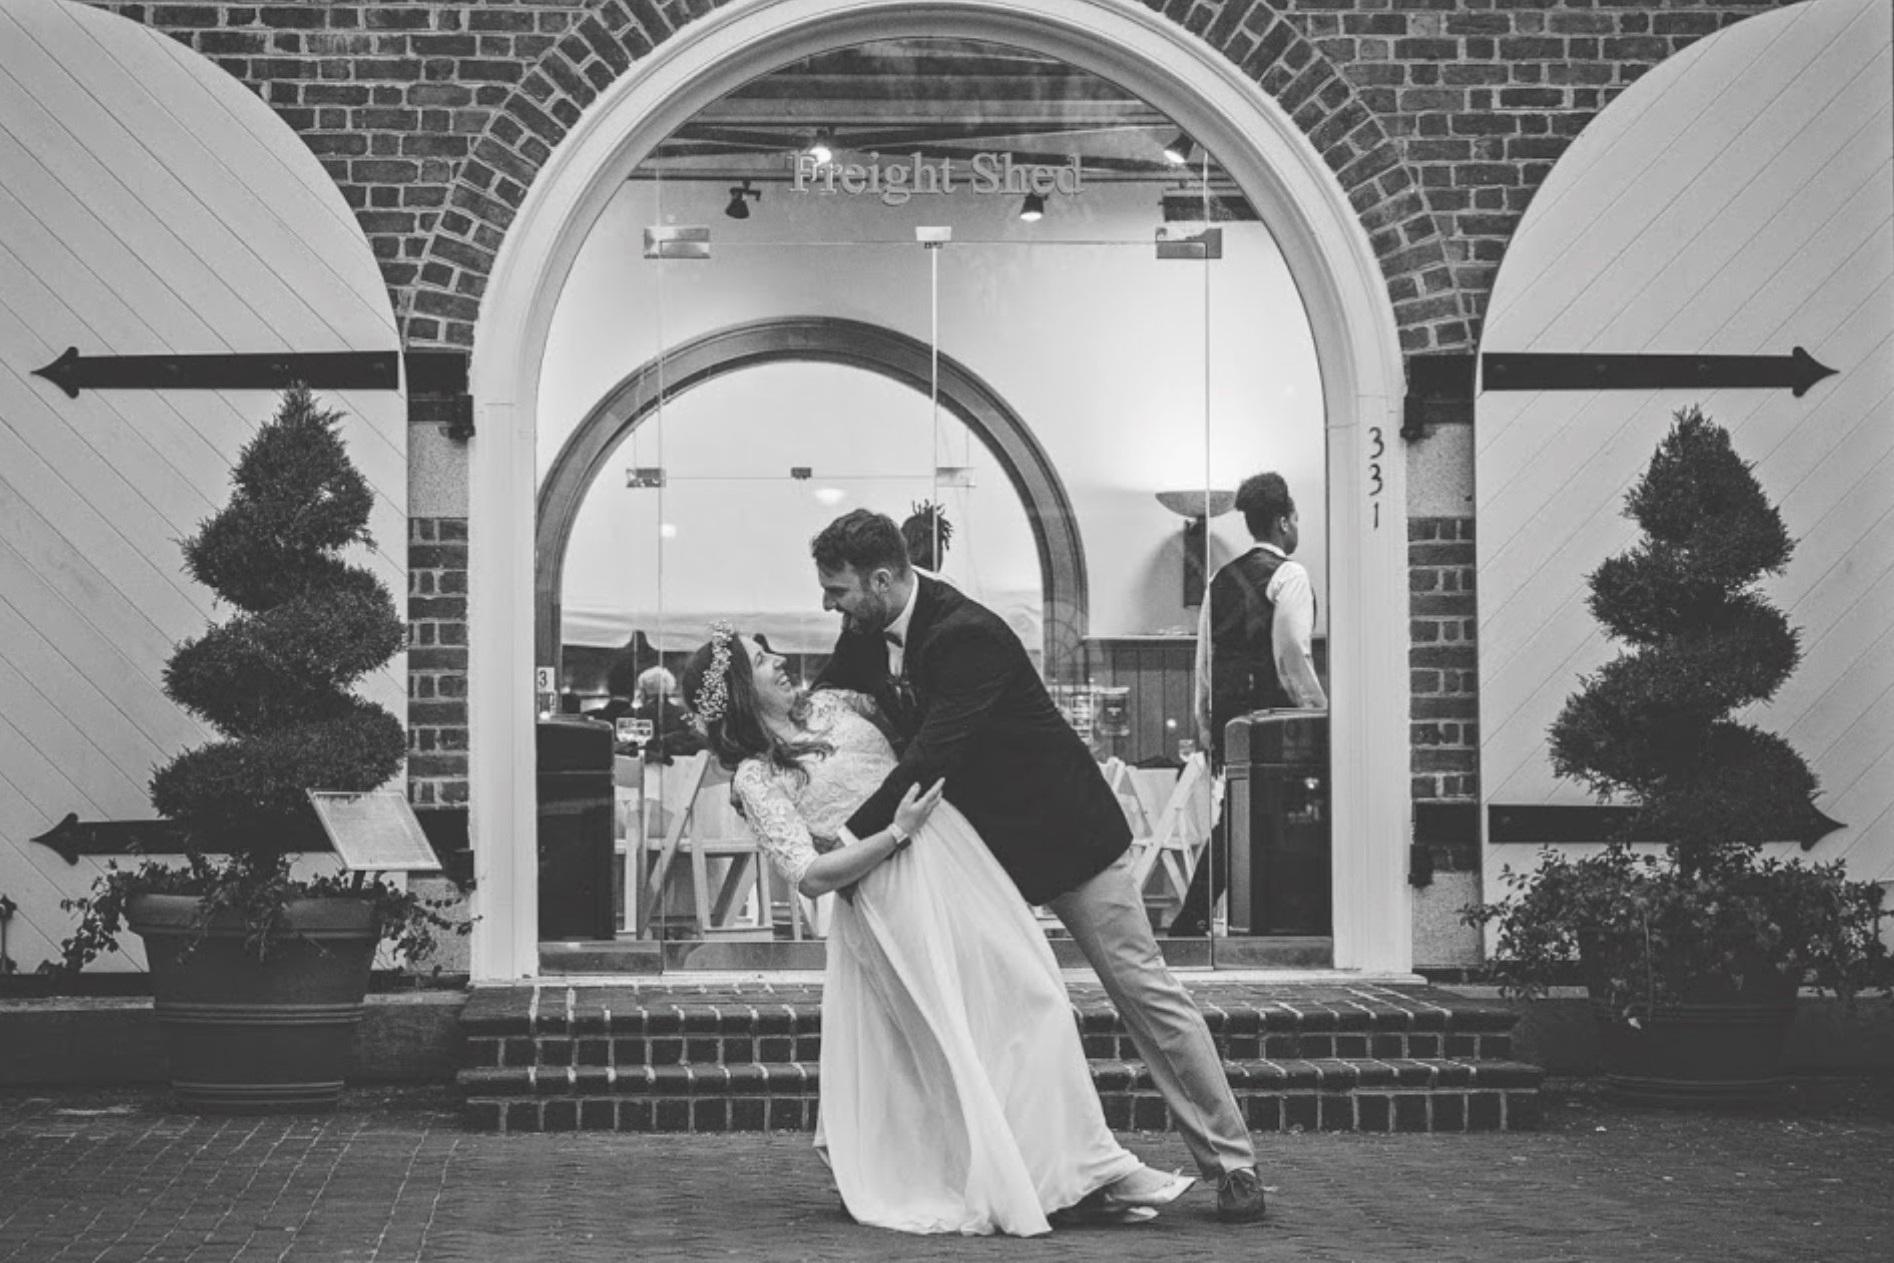 Brittany+%2B+Kris+-+Yorktown+Wedding.jpg